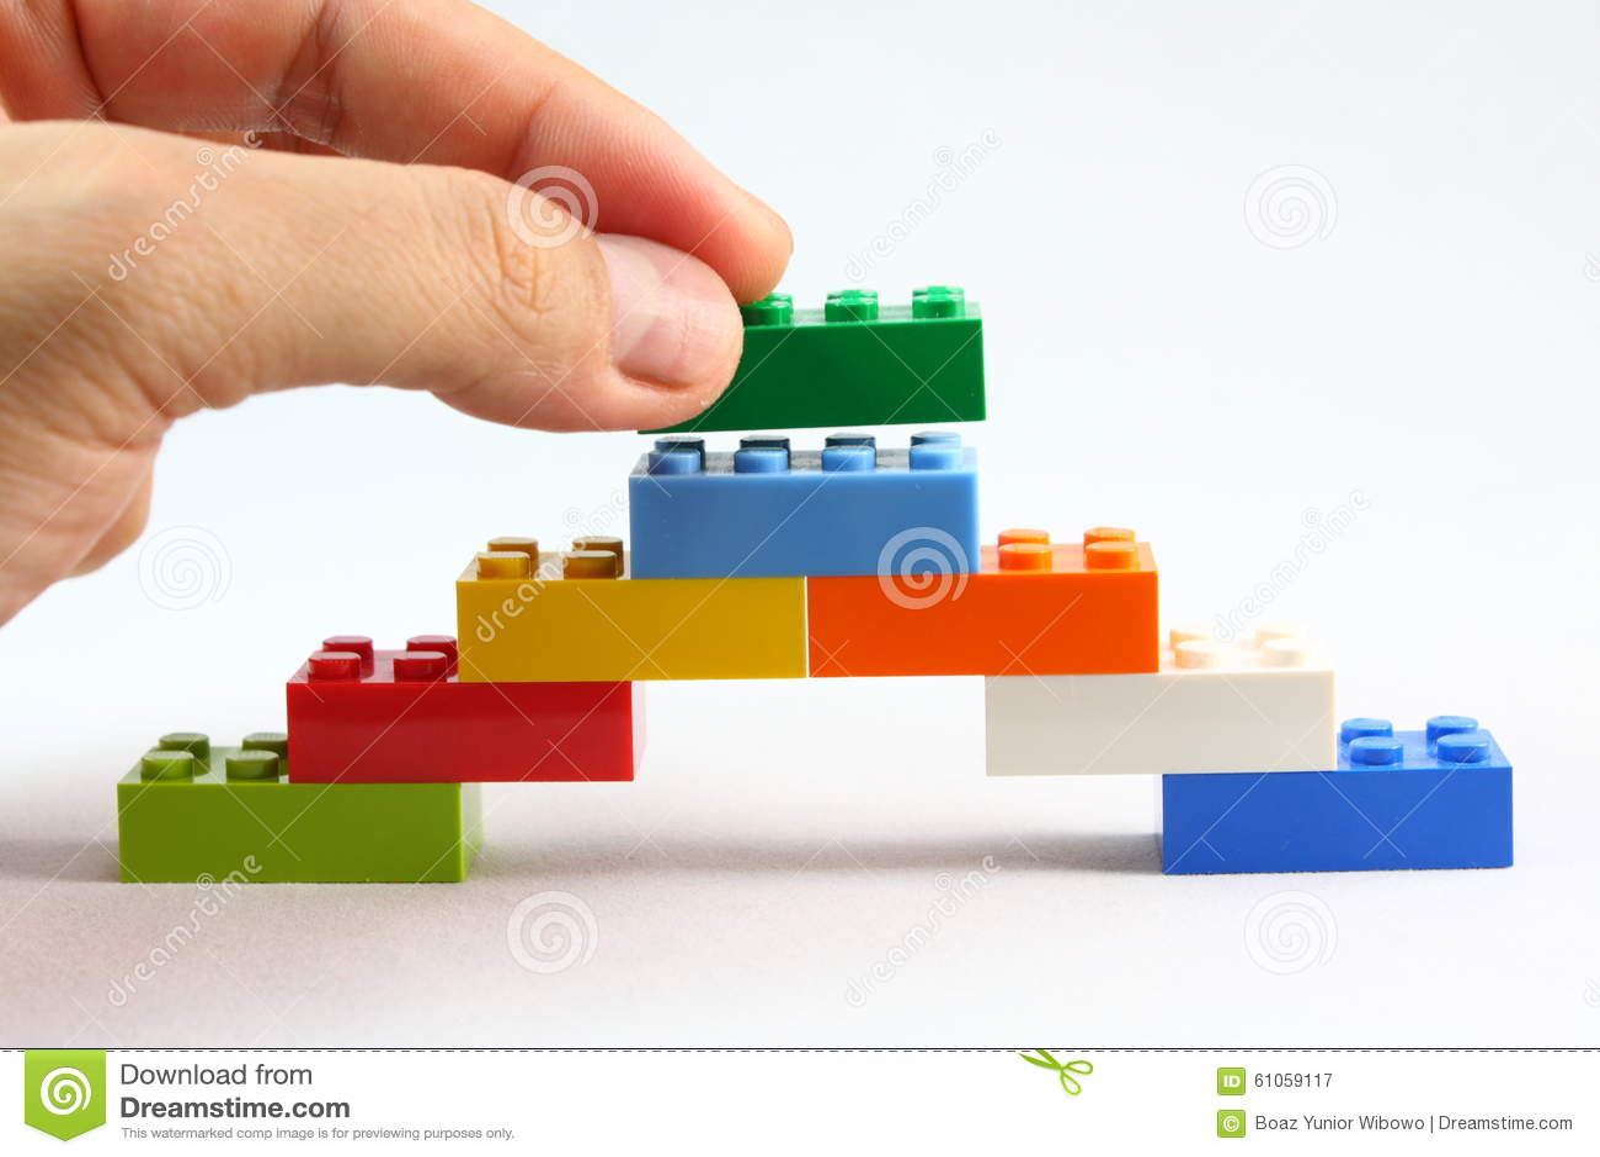 Bricks Game For Kids